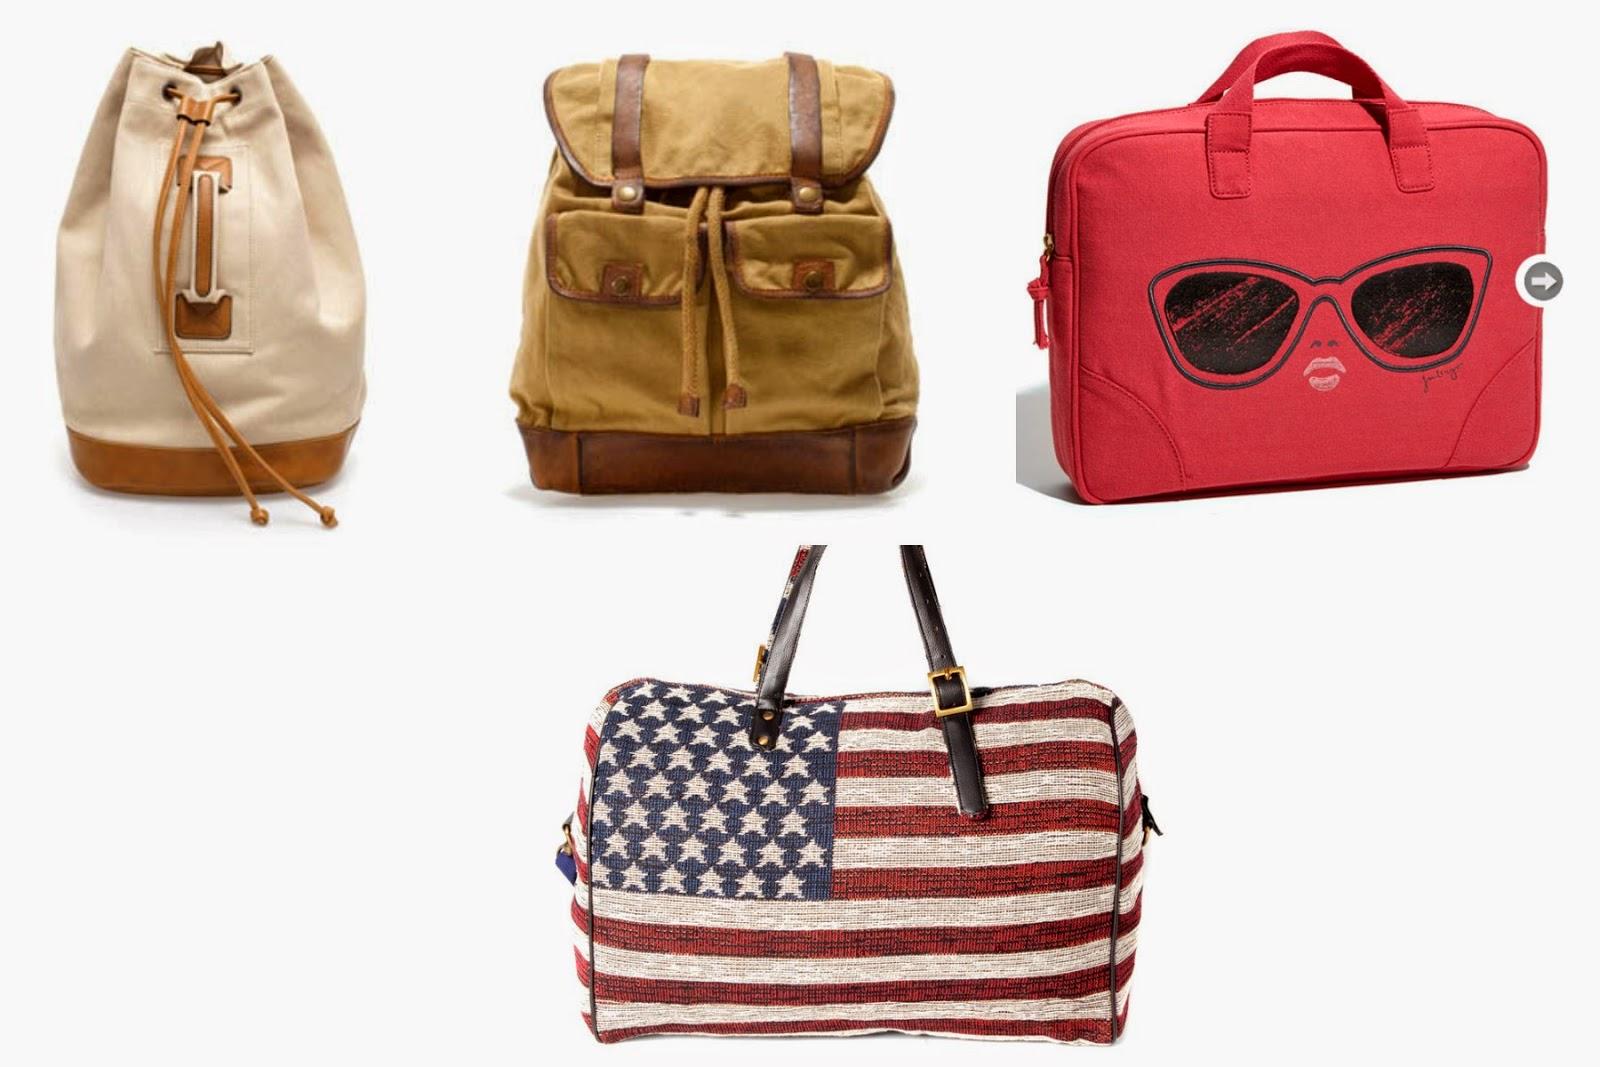 Regalos para viajeros: mochila o bolso viaje o excursion